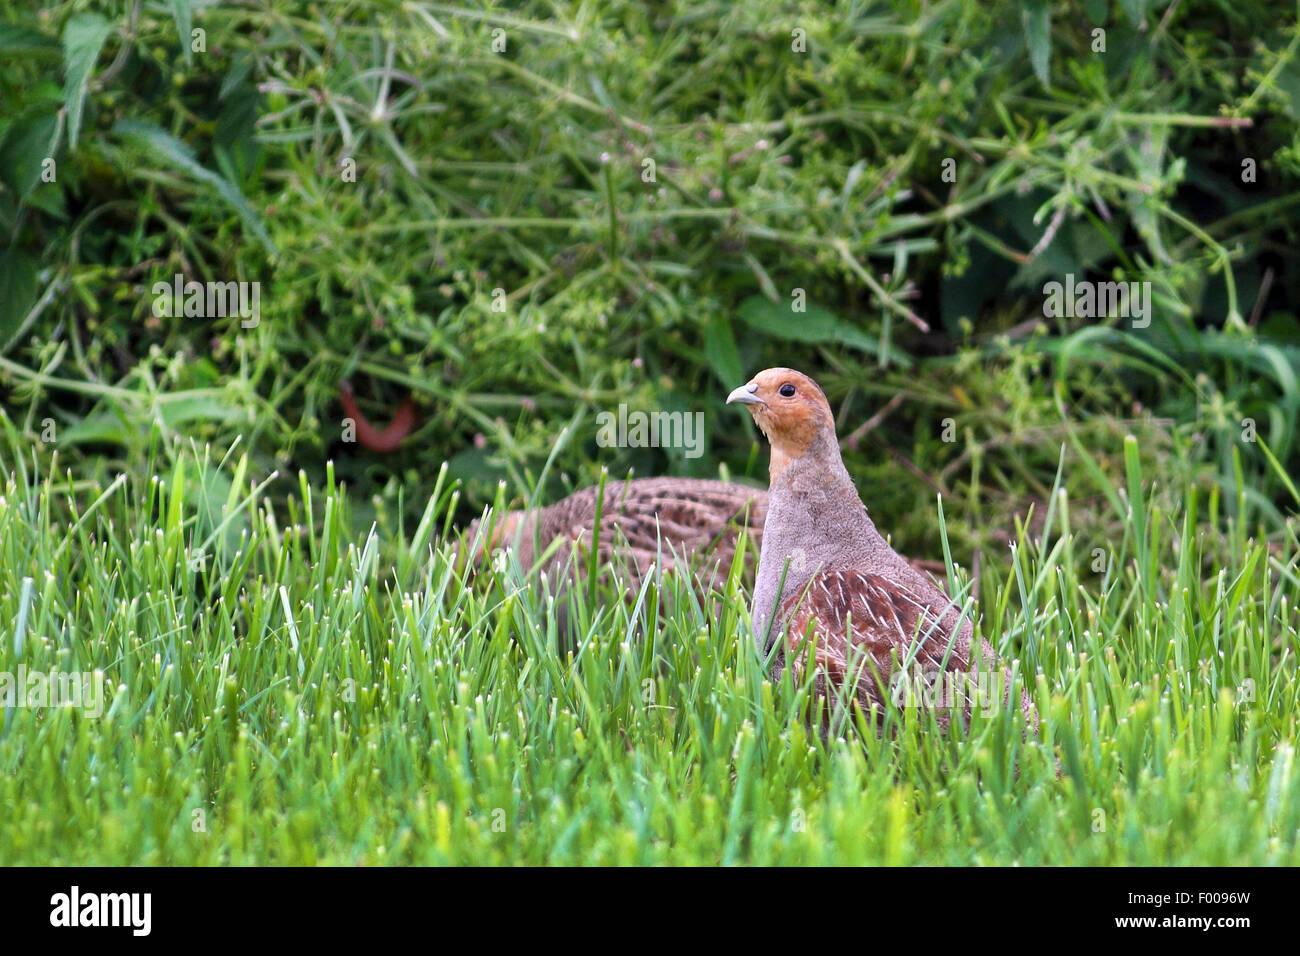 grey partridge (Perdix perdix), grey partridges on grass, Germany - Stock Image